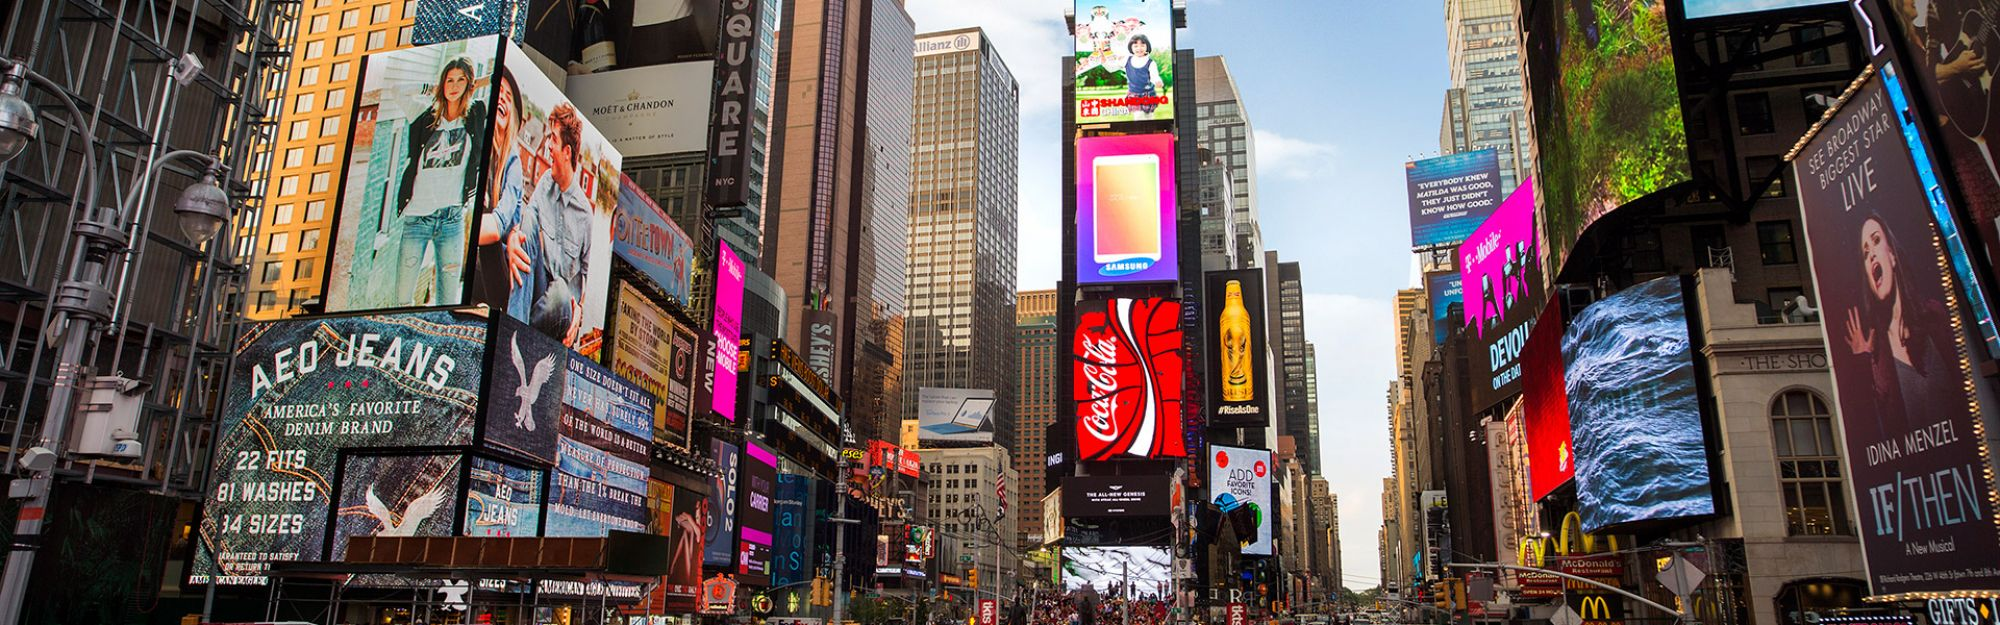 New York Uptown City Tour